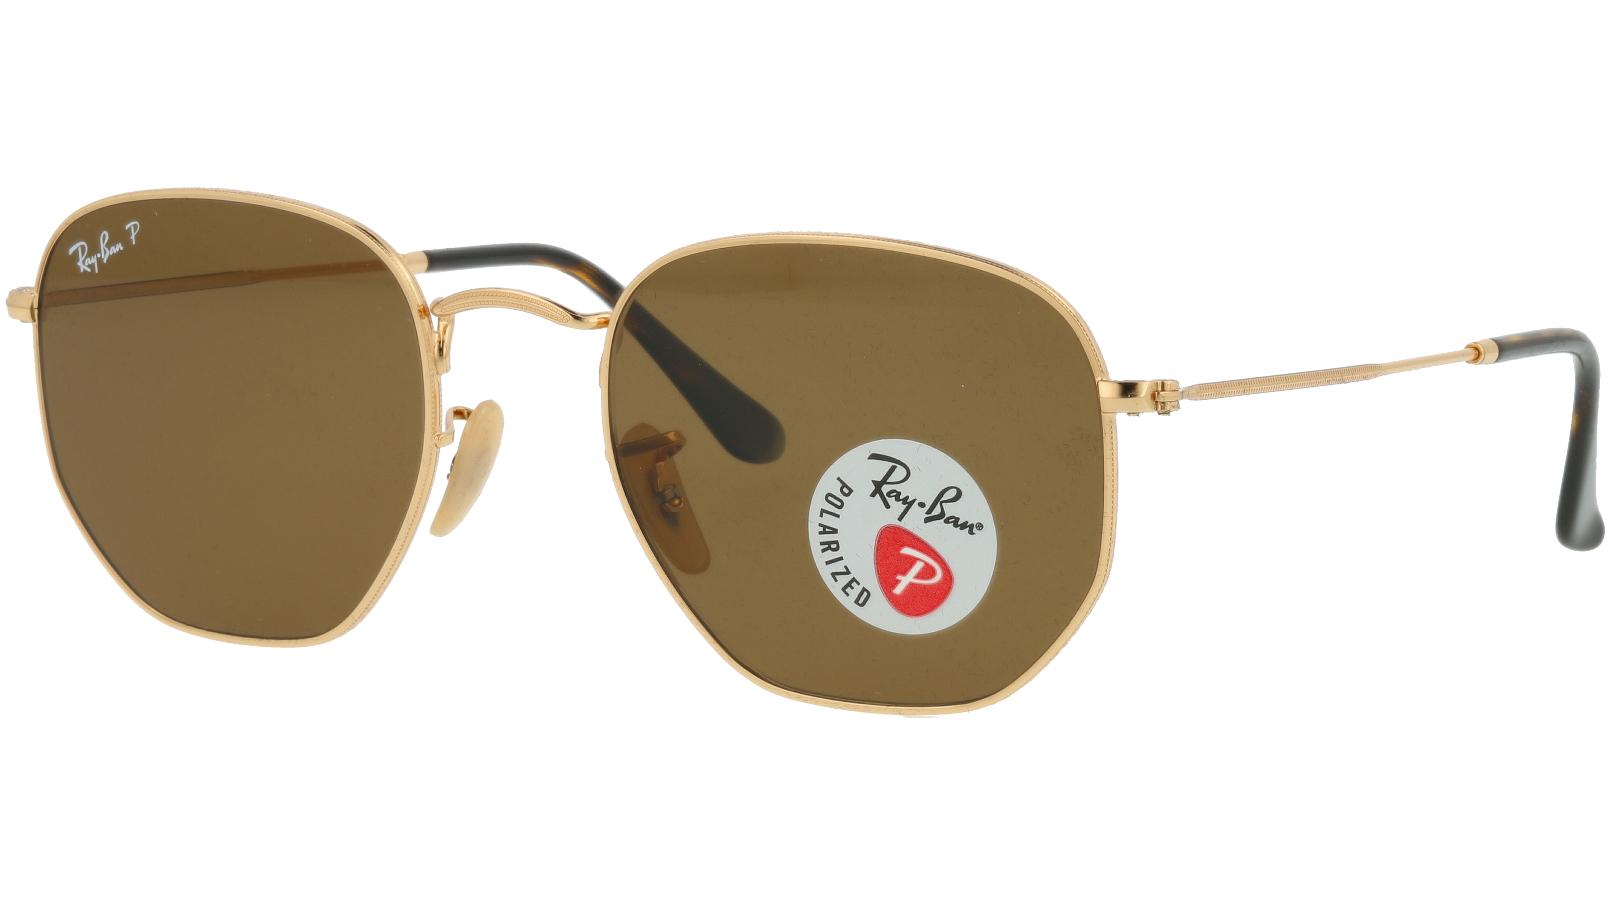 Ray-Ban RB3548N 001/57 54 Arista Polarized  Sunglasses